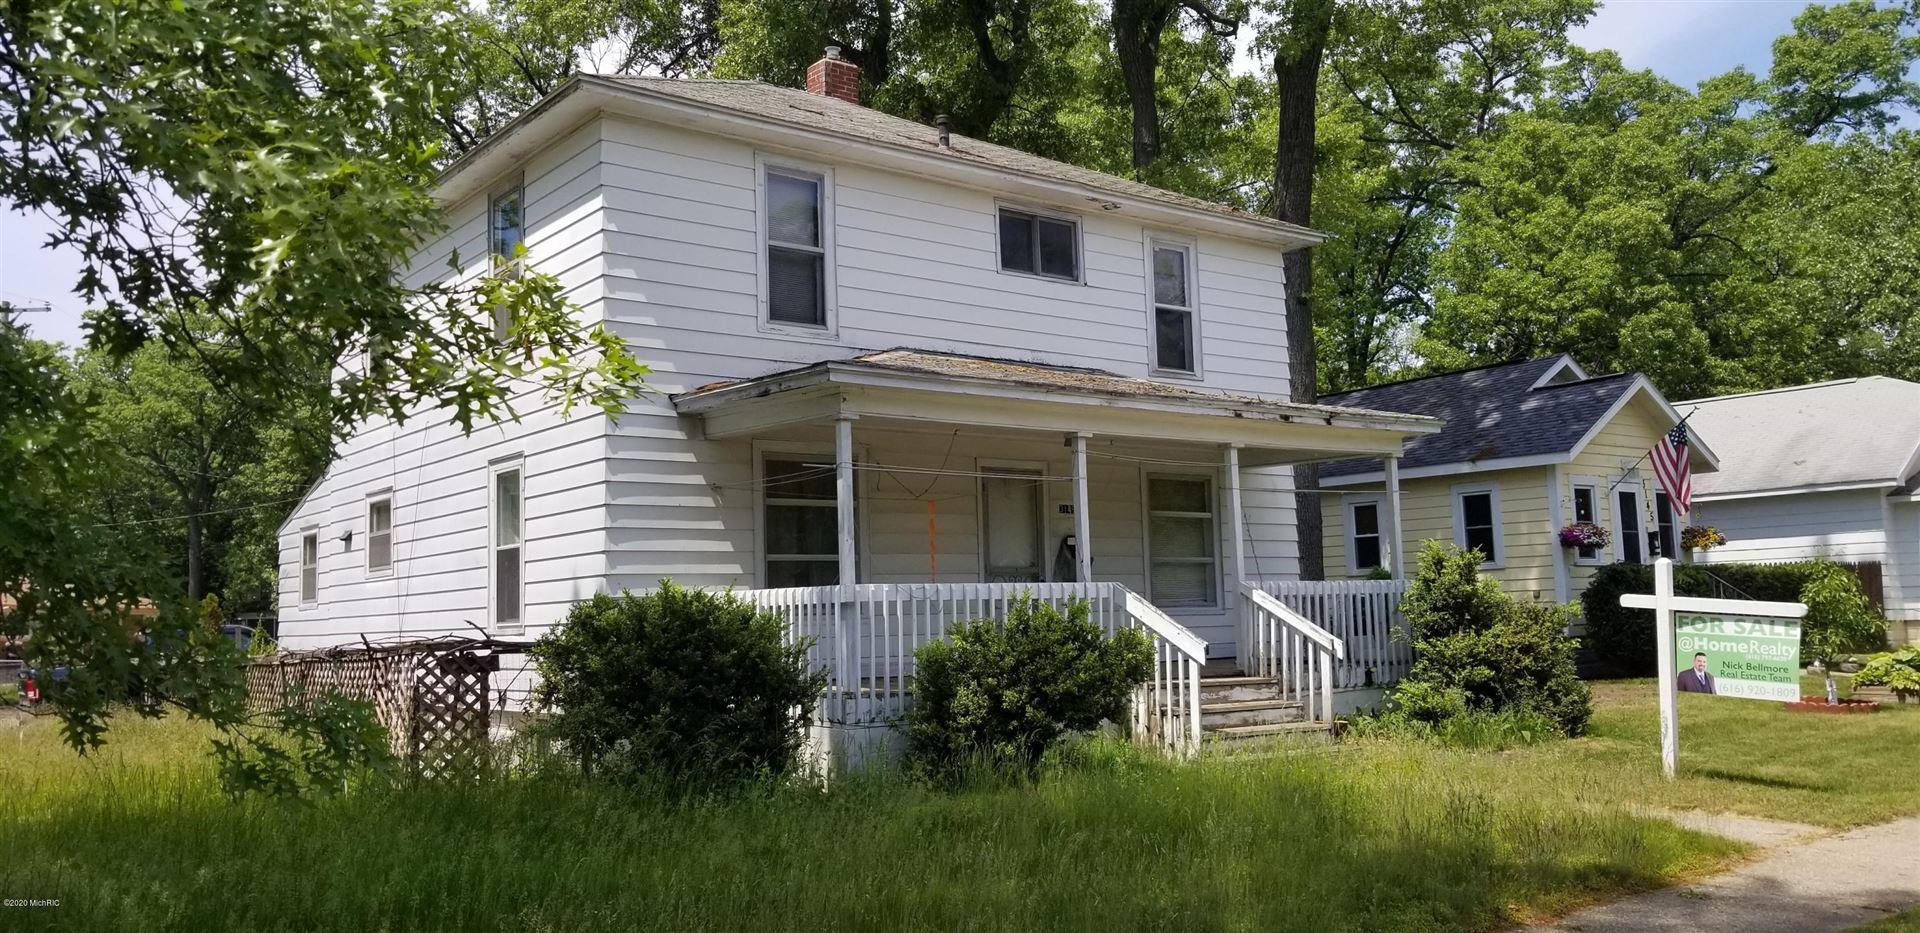 3149 Merriam Street, Muskegon, MI 49444 - #: 19055489